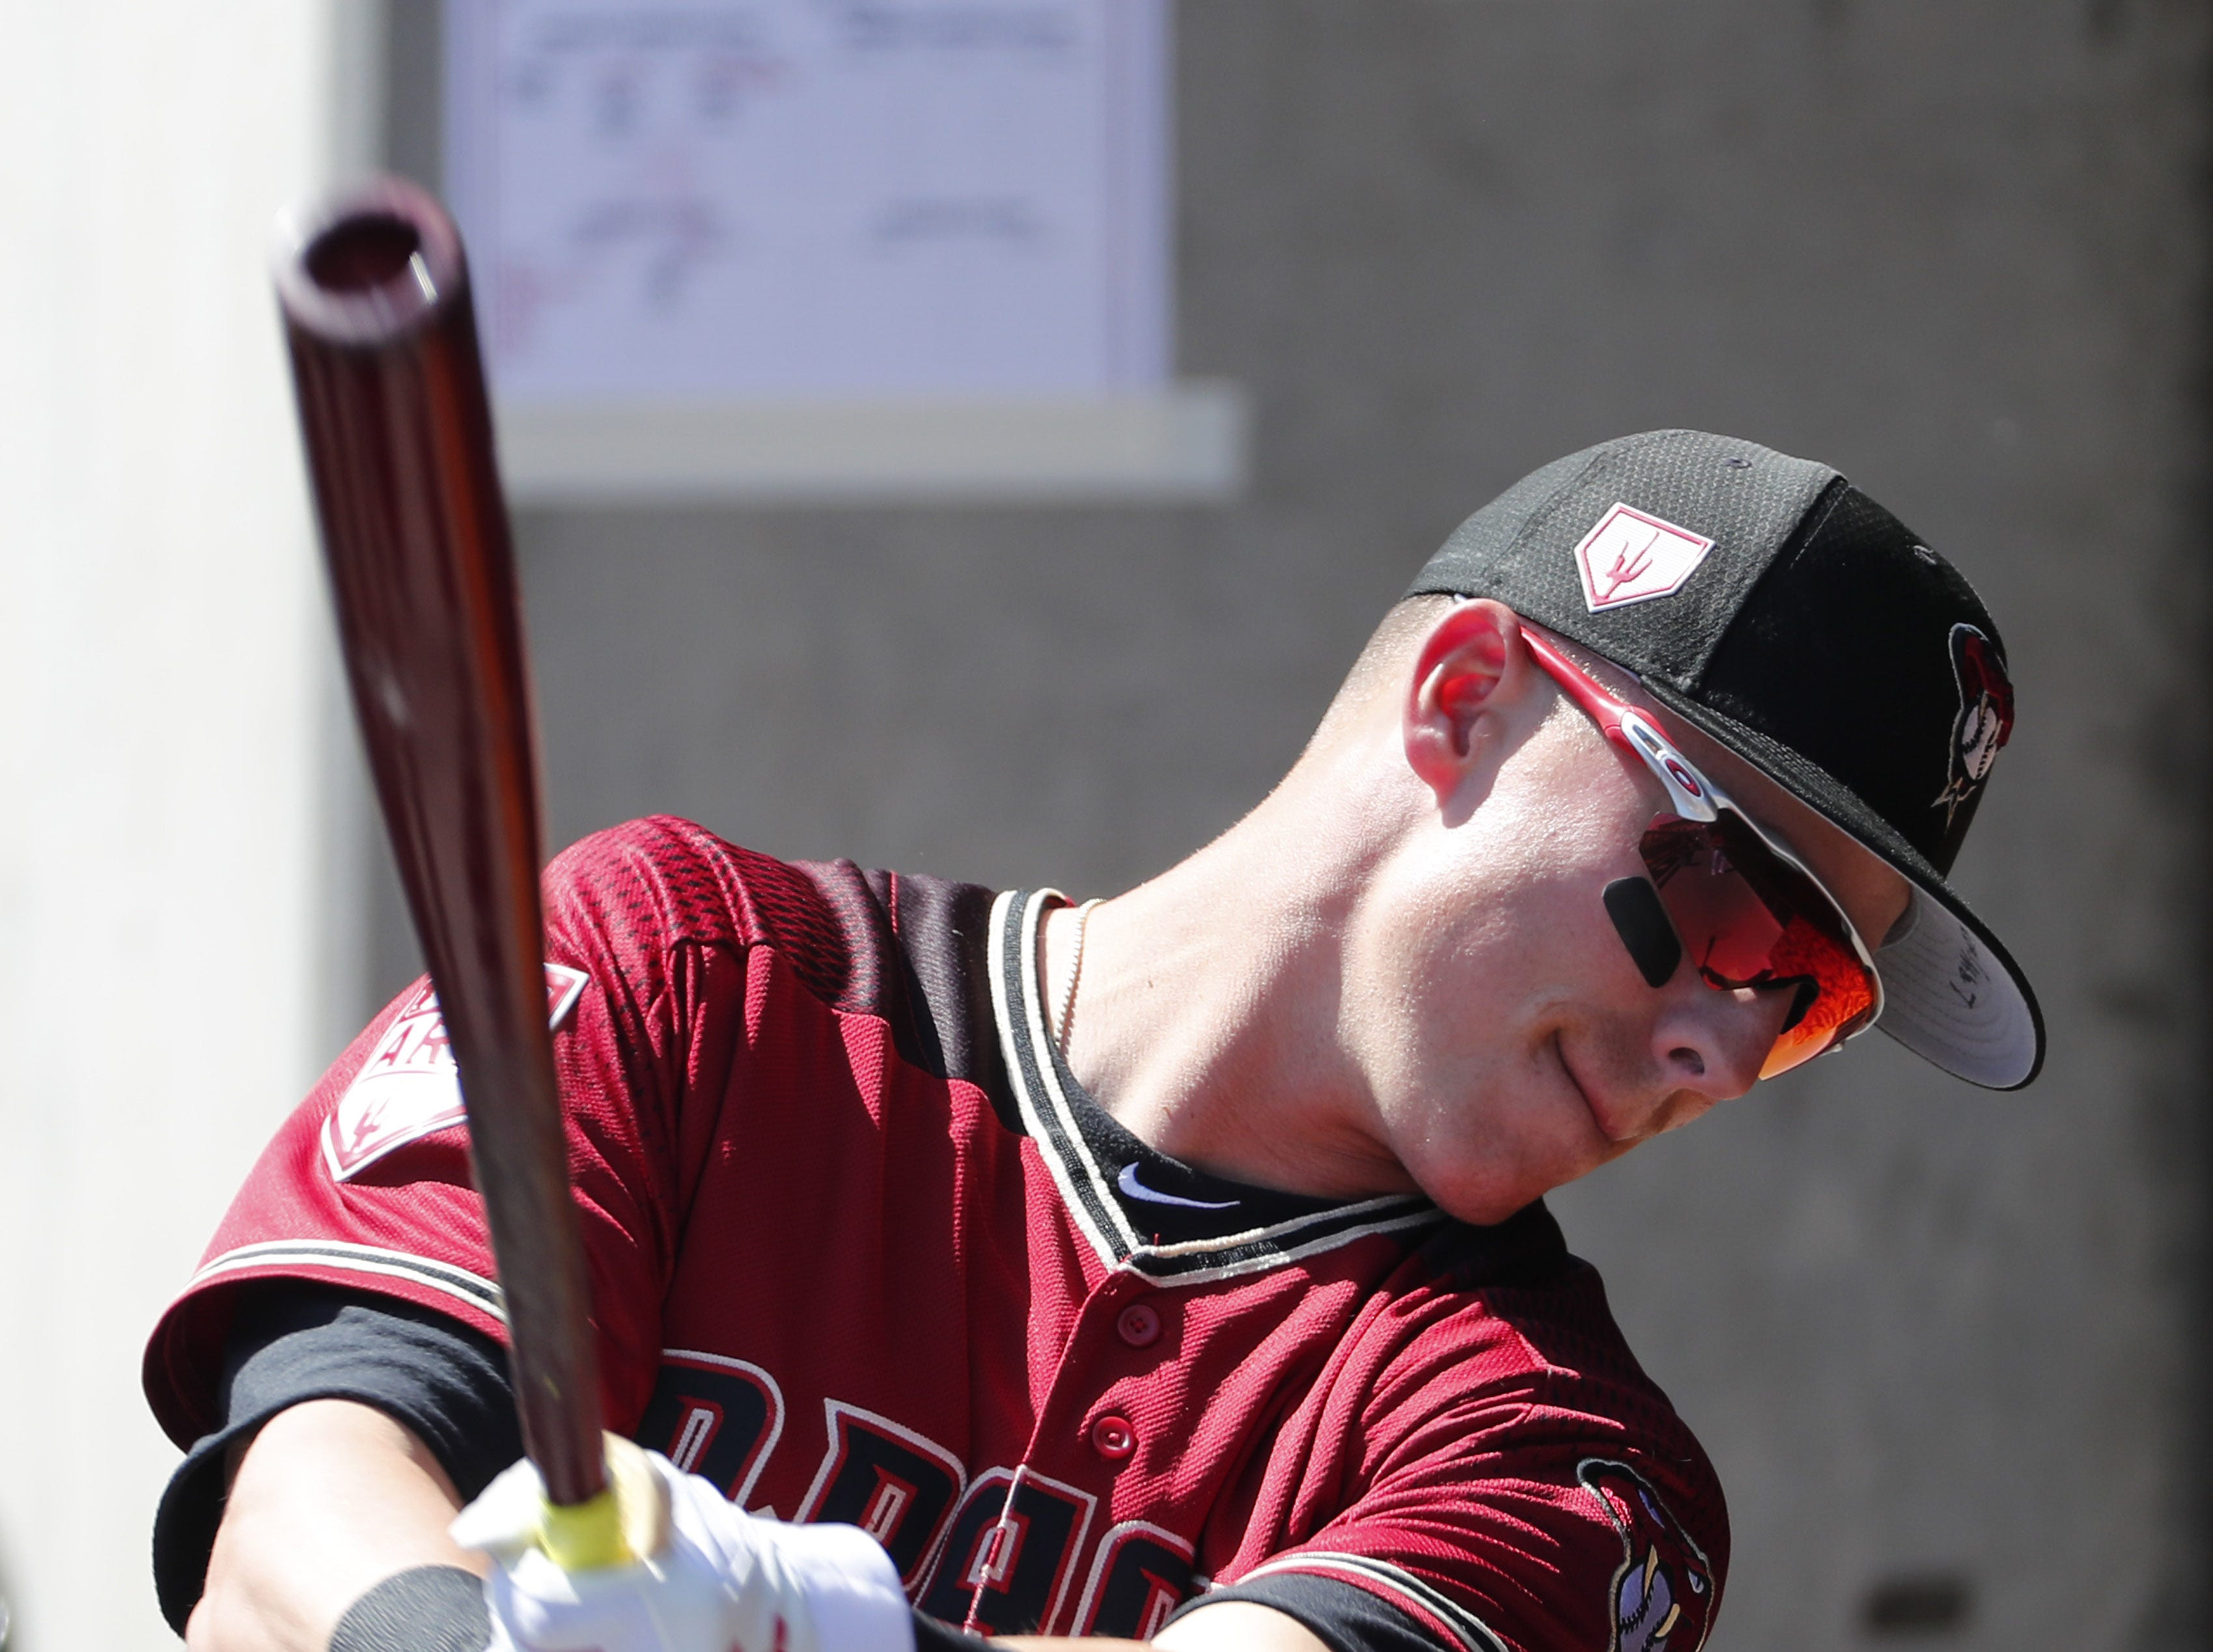 Arizona Diamondbacks first baseman Jake Lamb (22) prepares to bat against the Milwaukee Brewers during spring training at Salt River Fields at Talking Stick March 24, 2019.